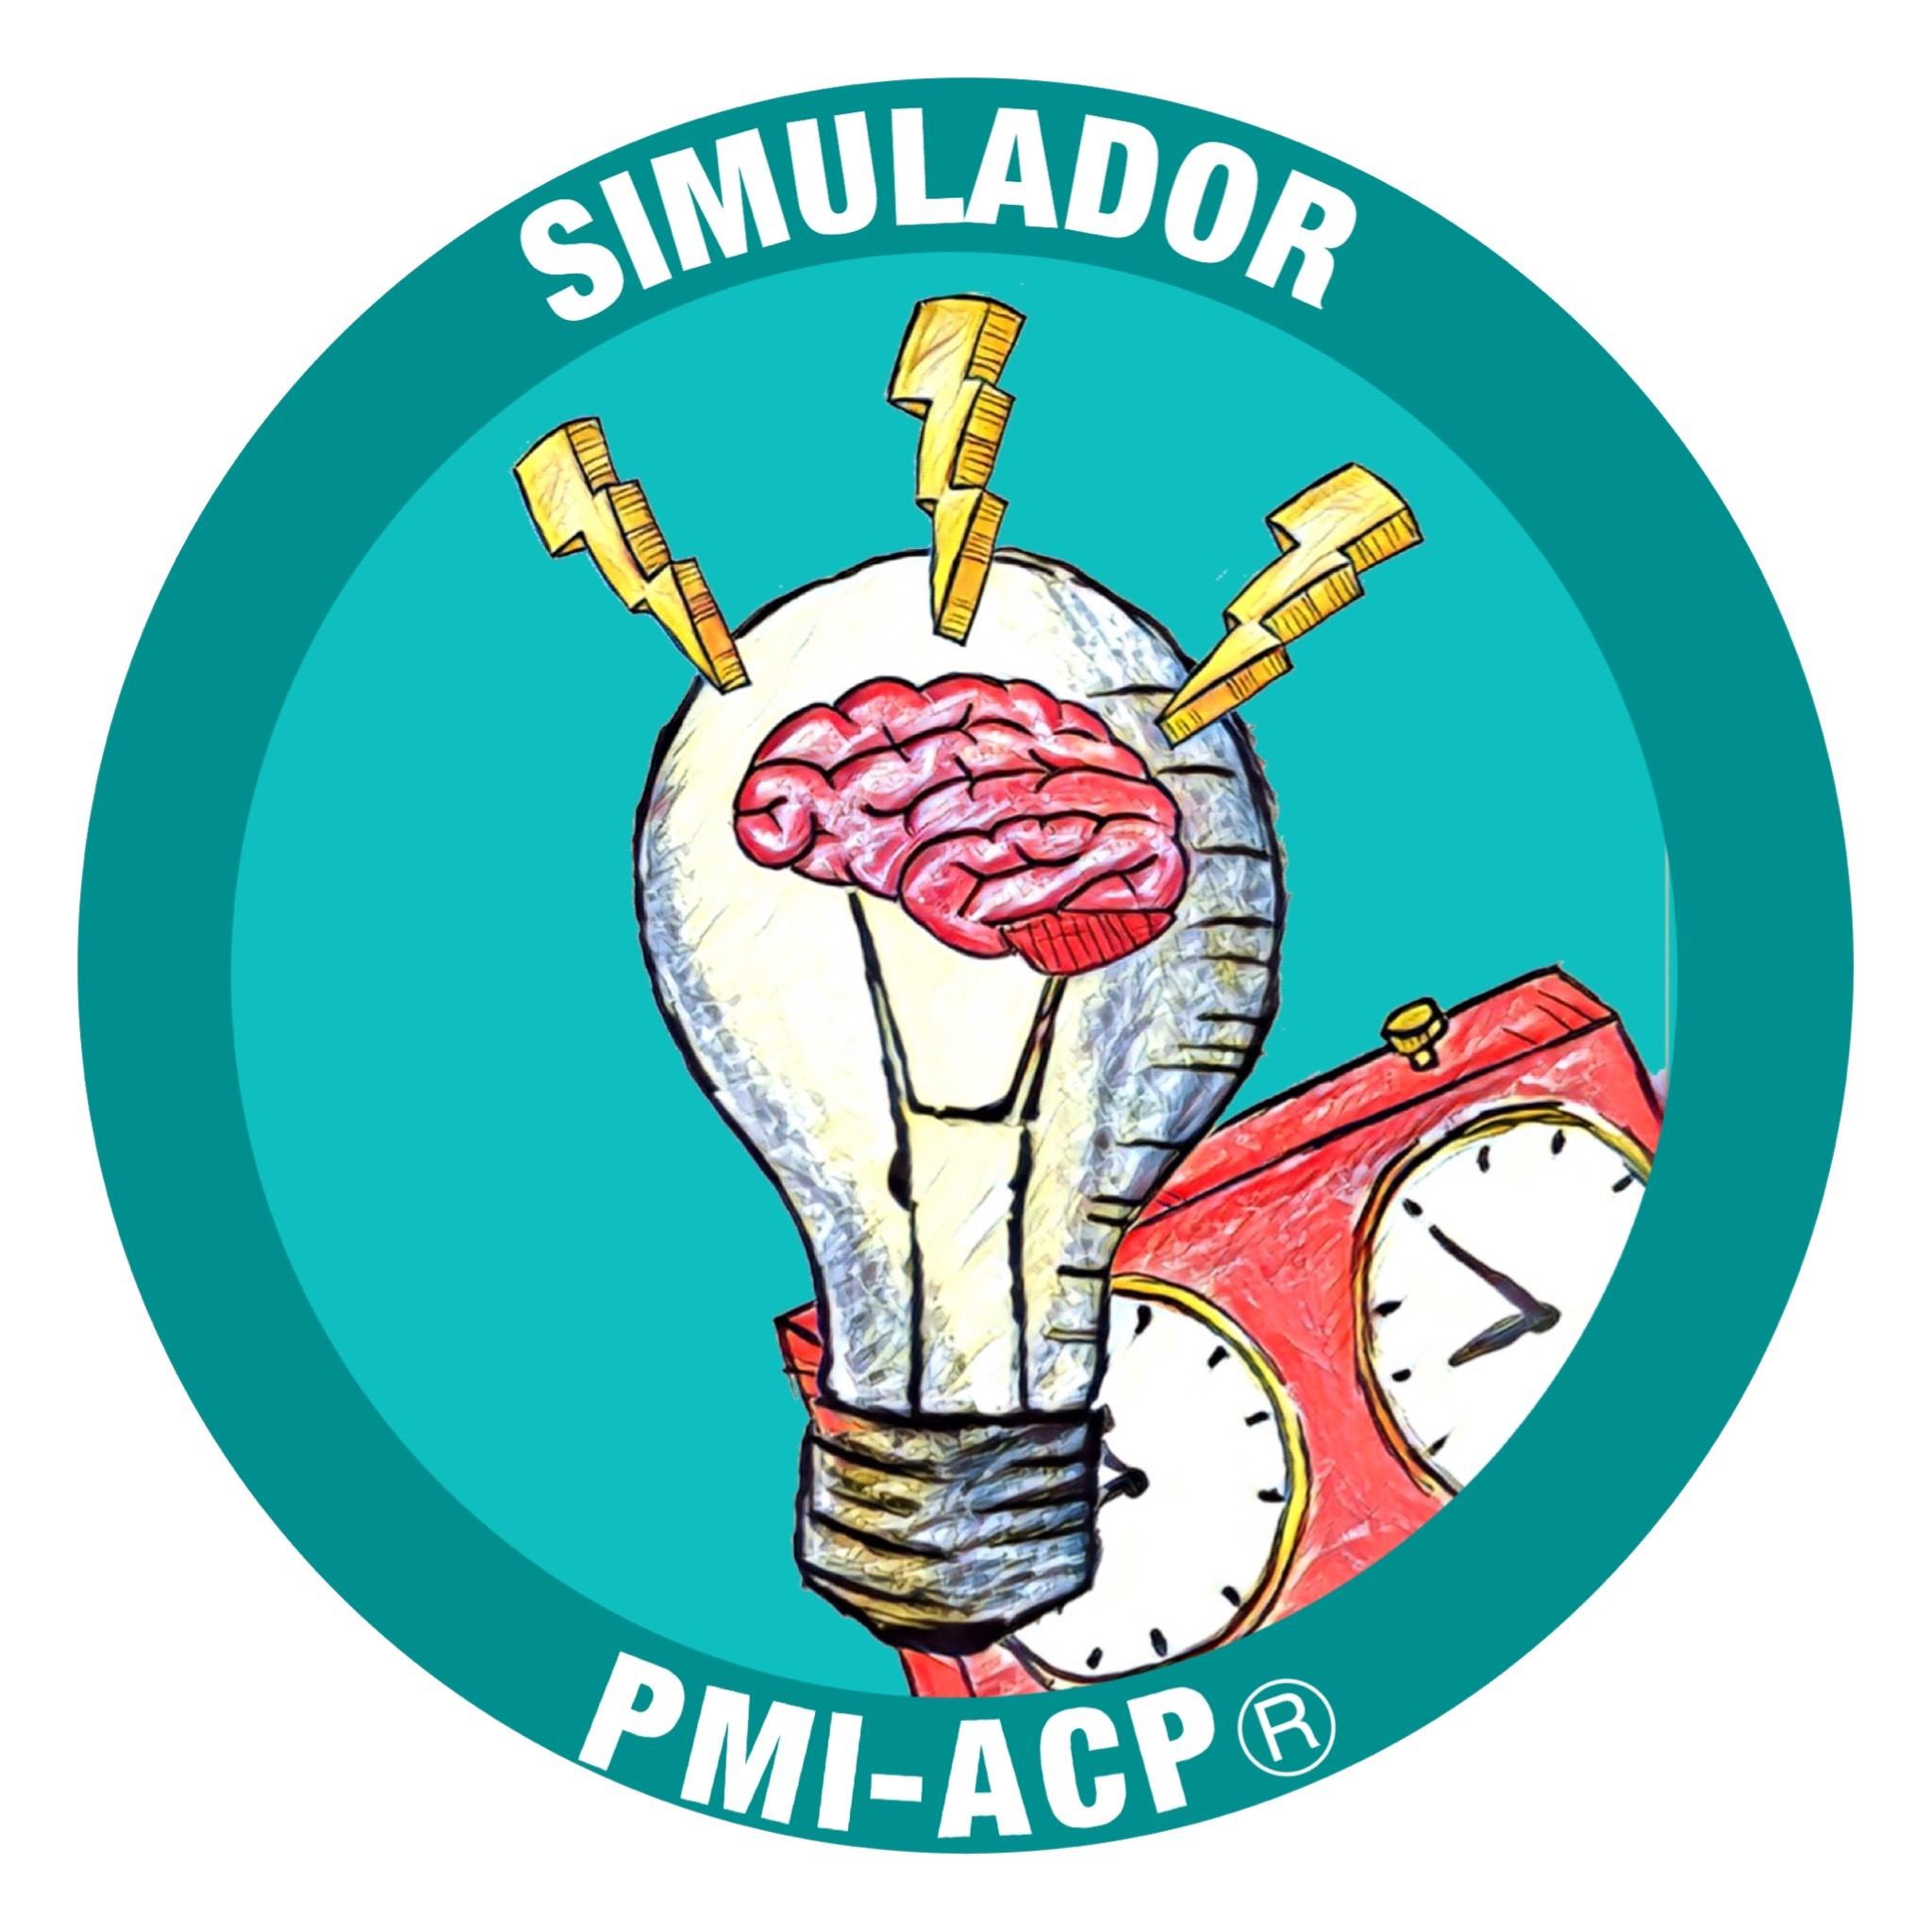 simulador-pmi-acp.jpg